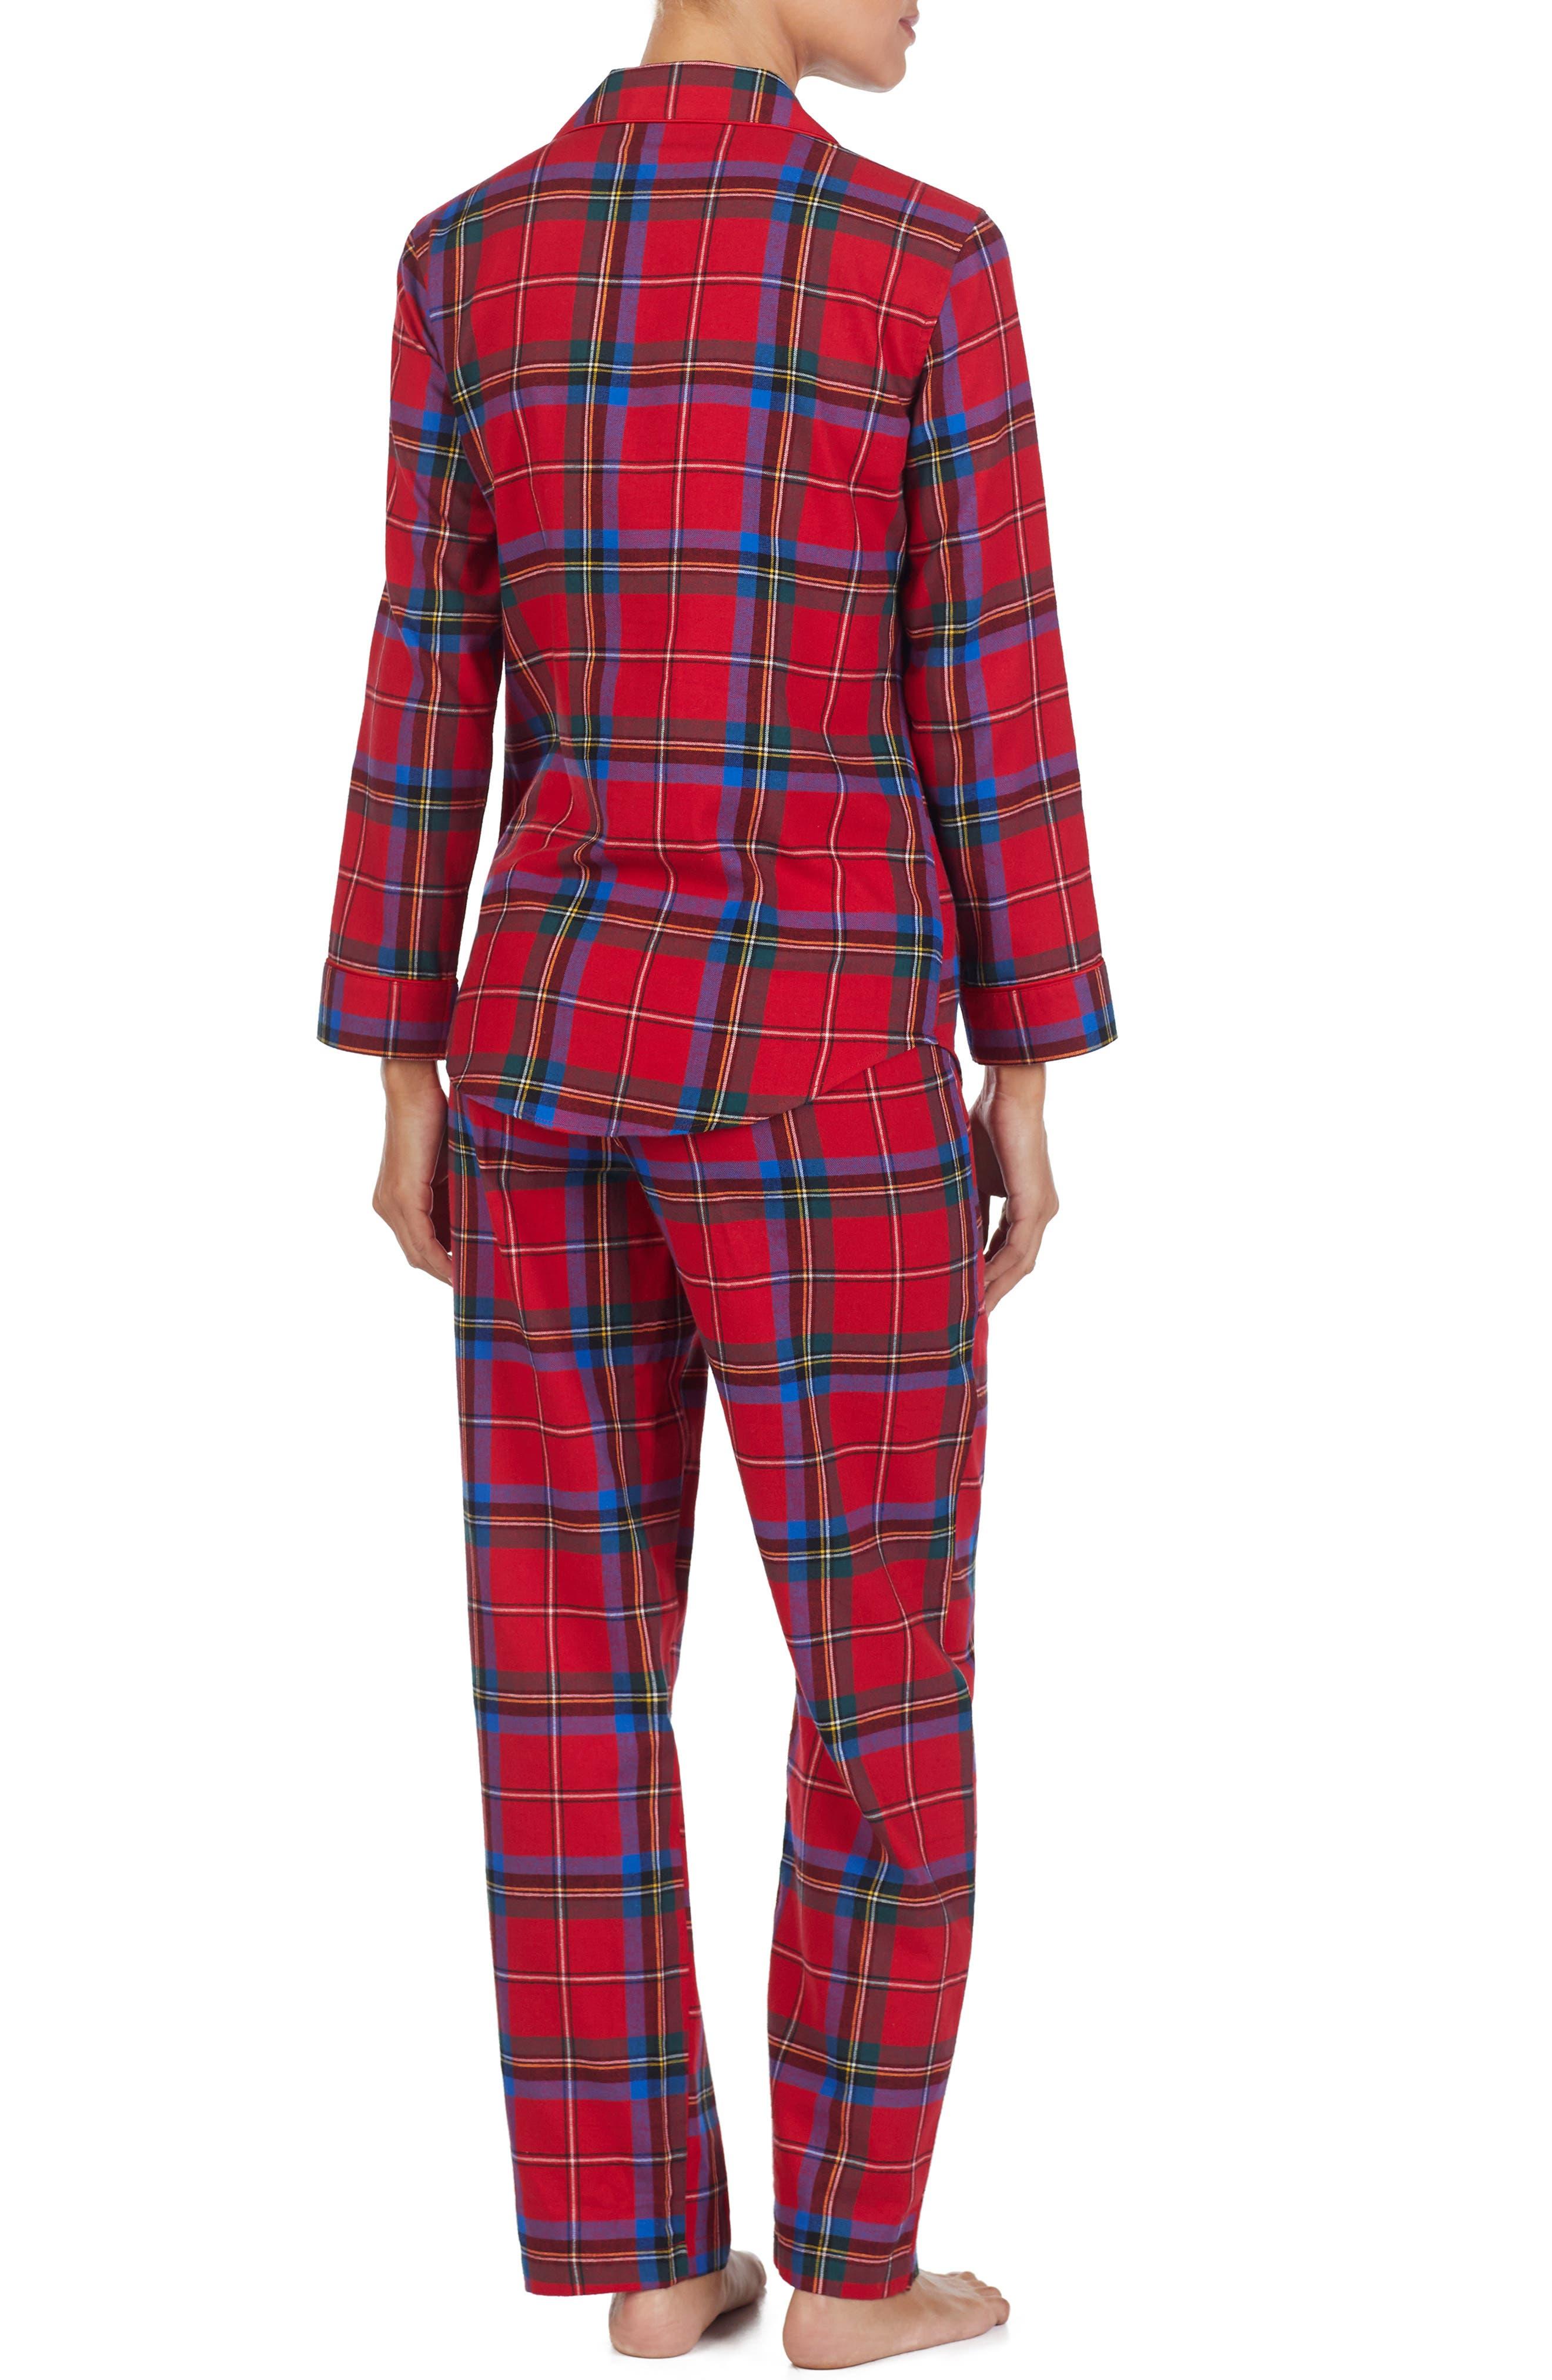 LAUREN RALPH LAUREN,                             Flannel Pajamas,                             Alternate thumbnail 2, color,                             644